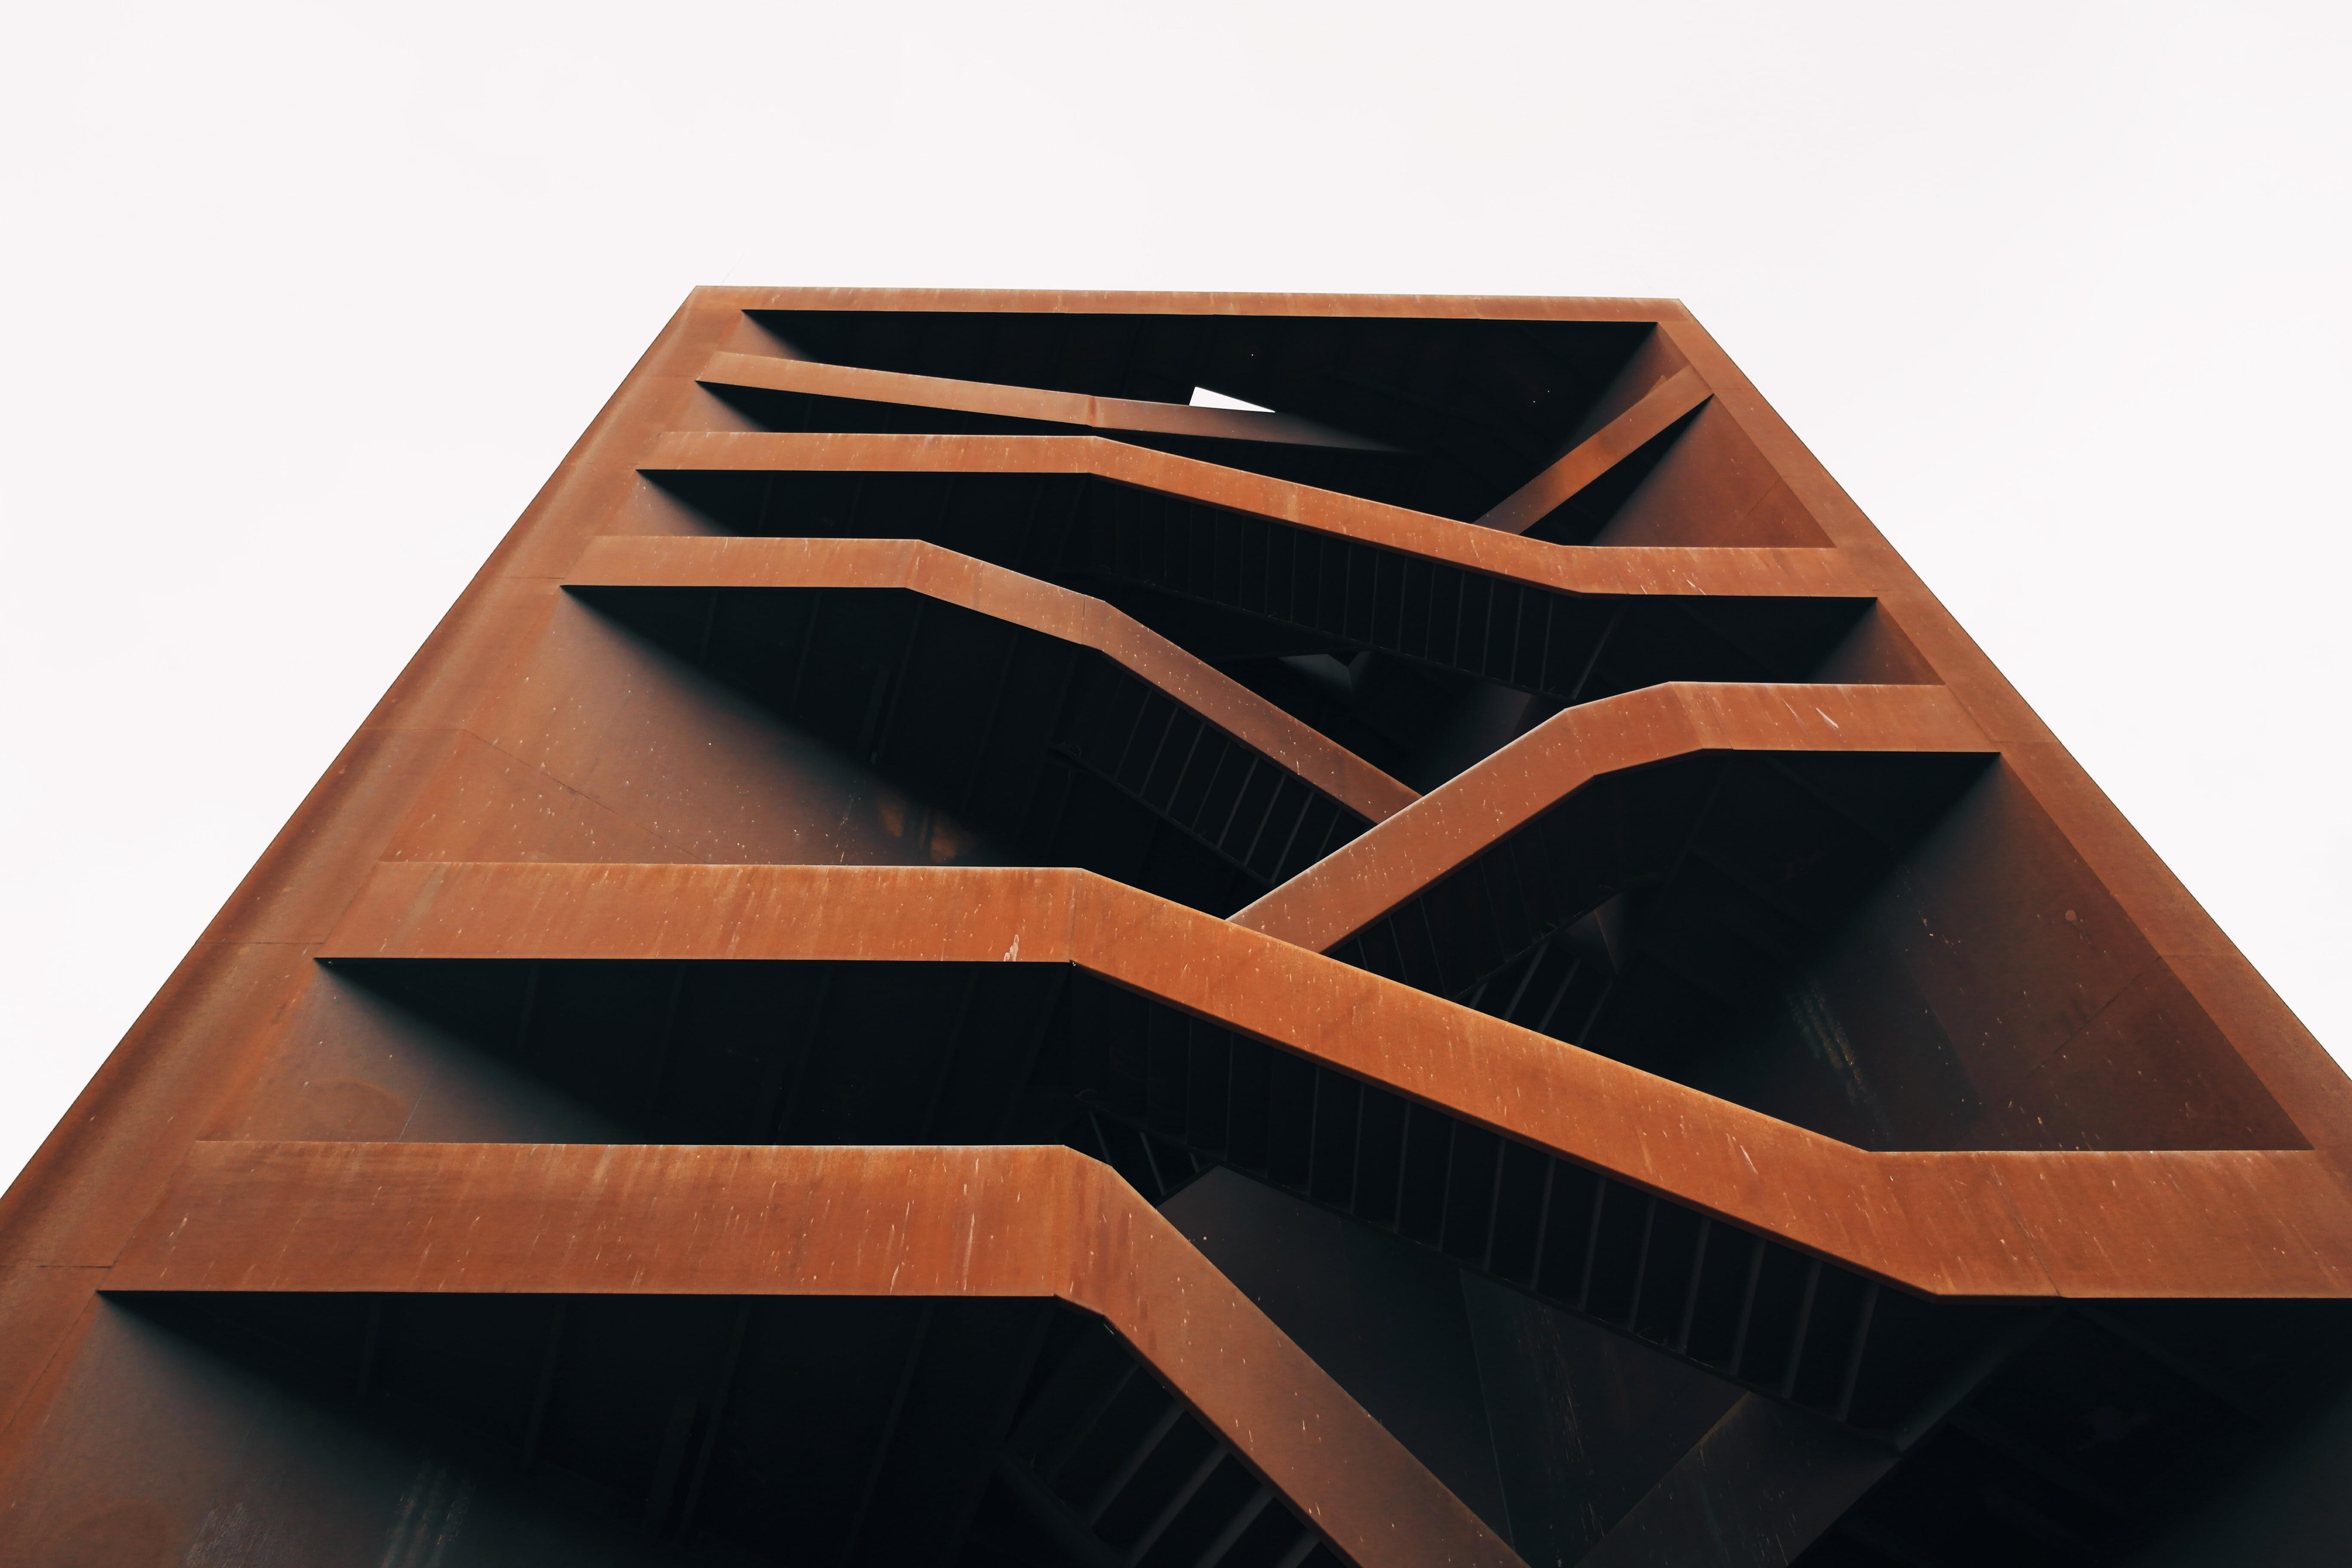 Fotos Gratis Mesa Estructura Moho Caja Mueble Escultura  # Moho Muebles Madera